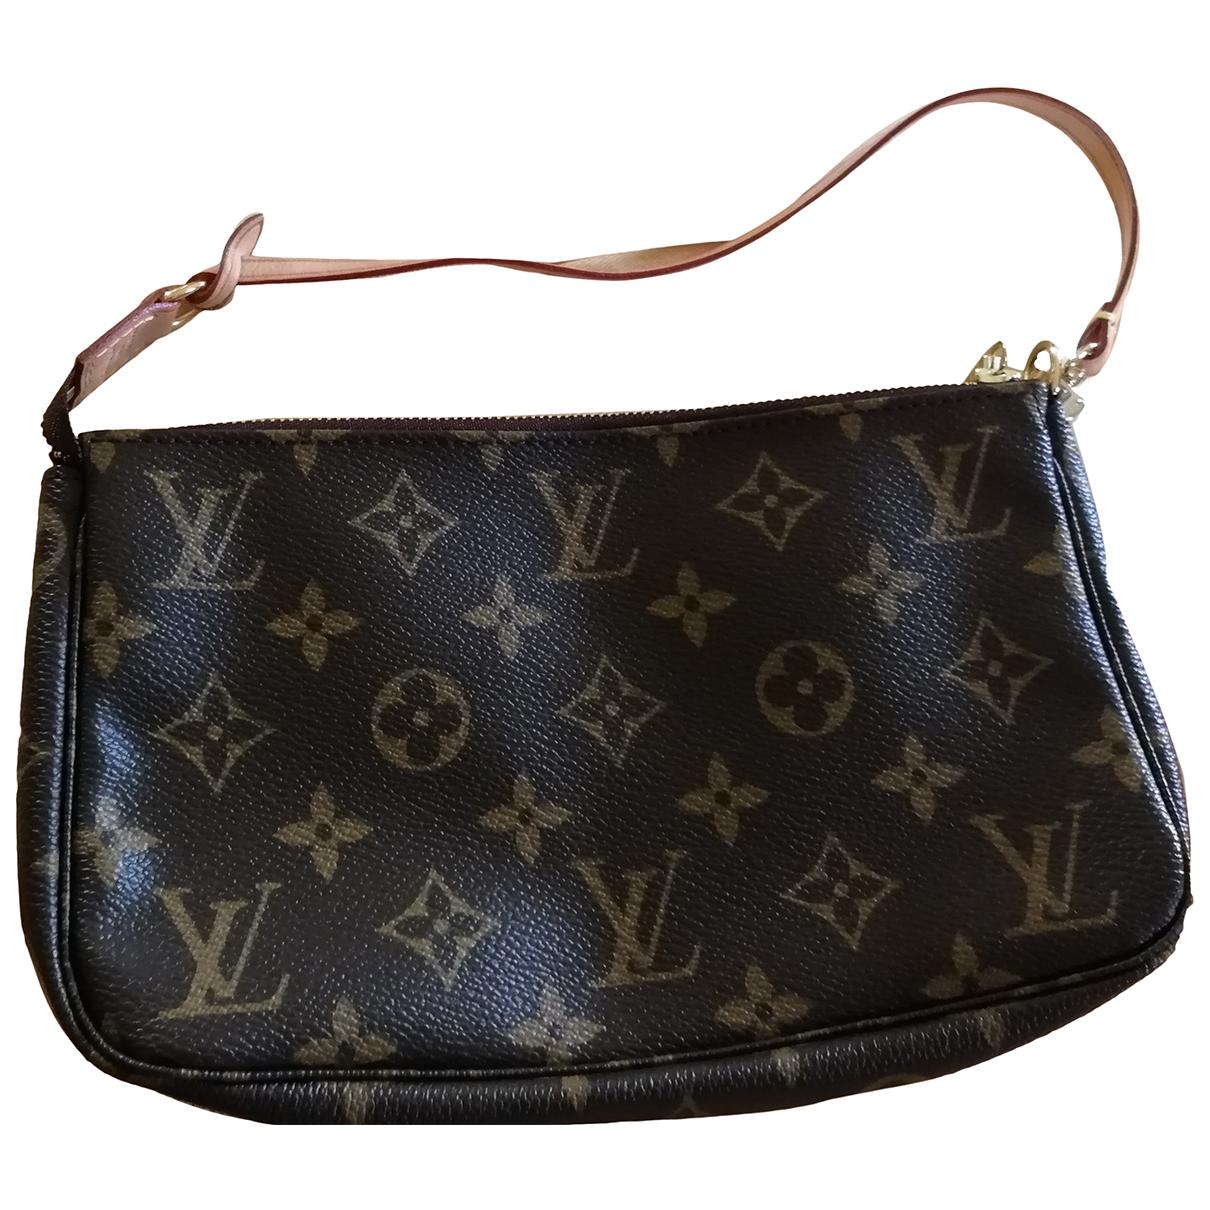 Louis Vuitton Pochette Accessoire Clutch in  Braun Leder